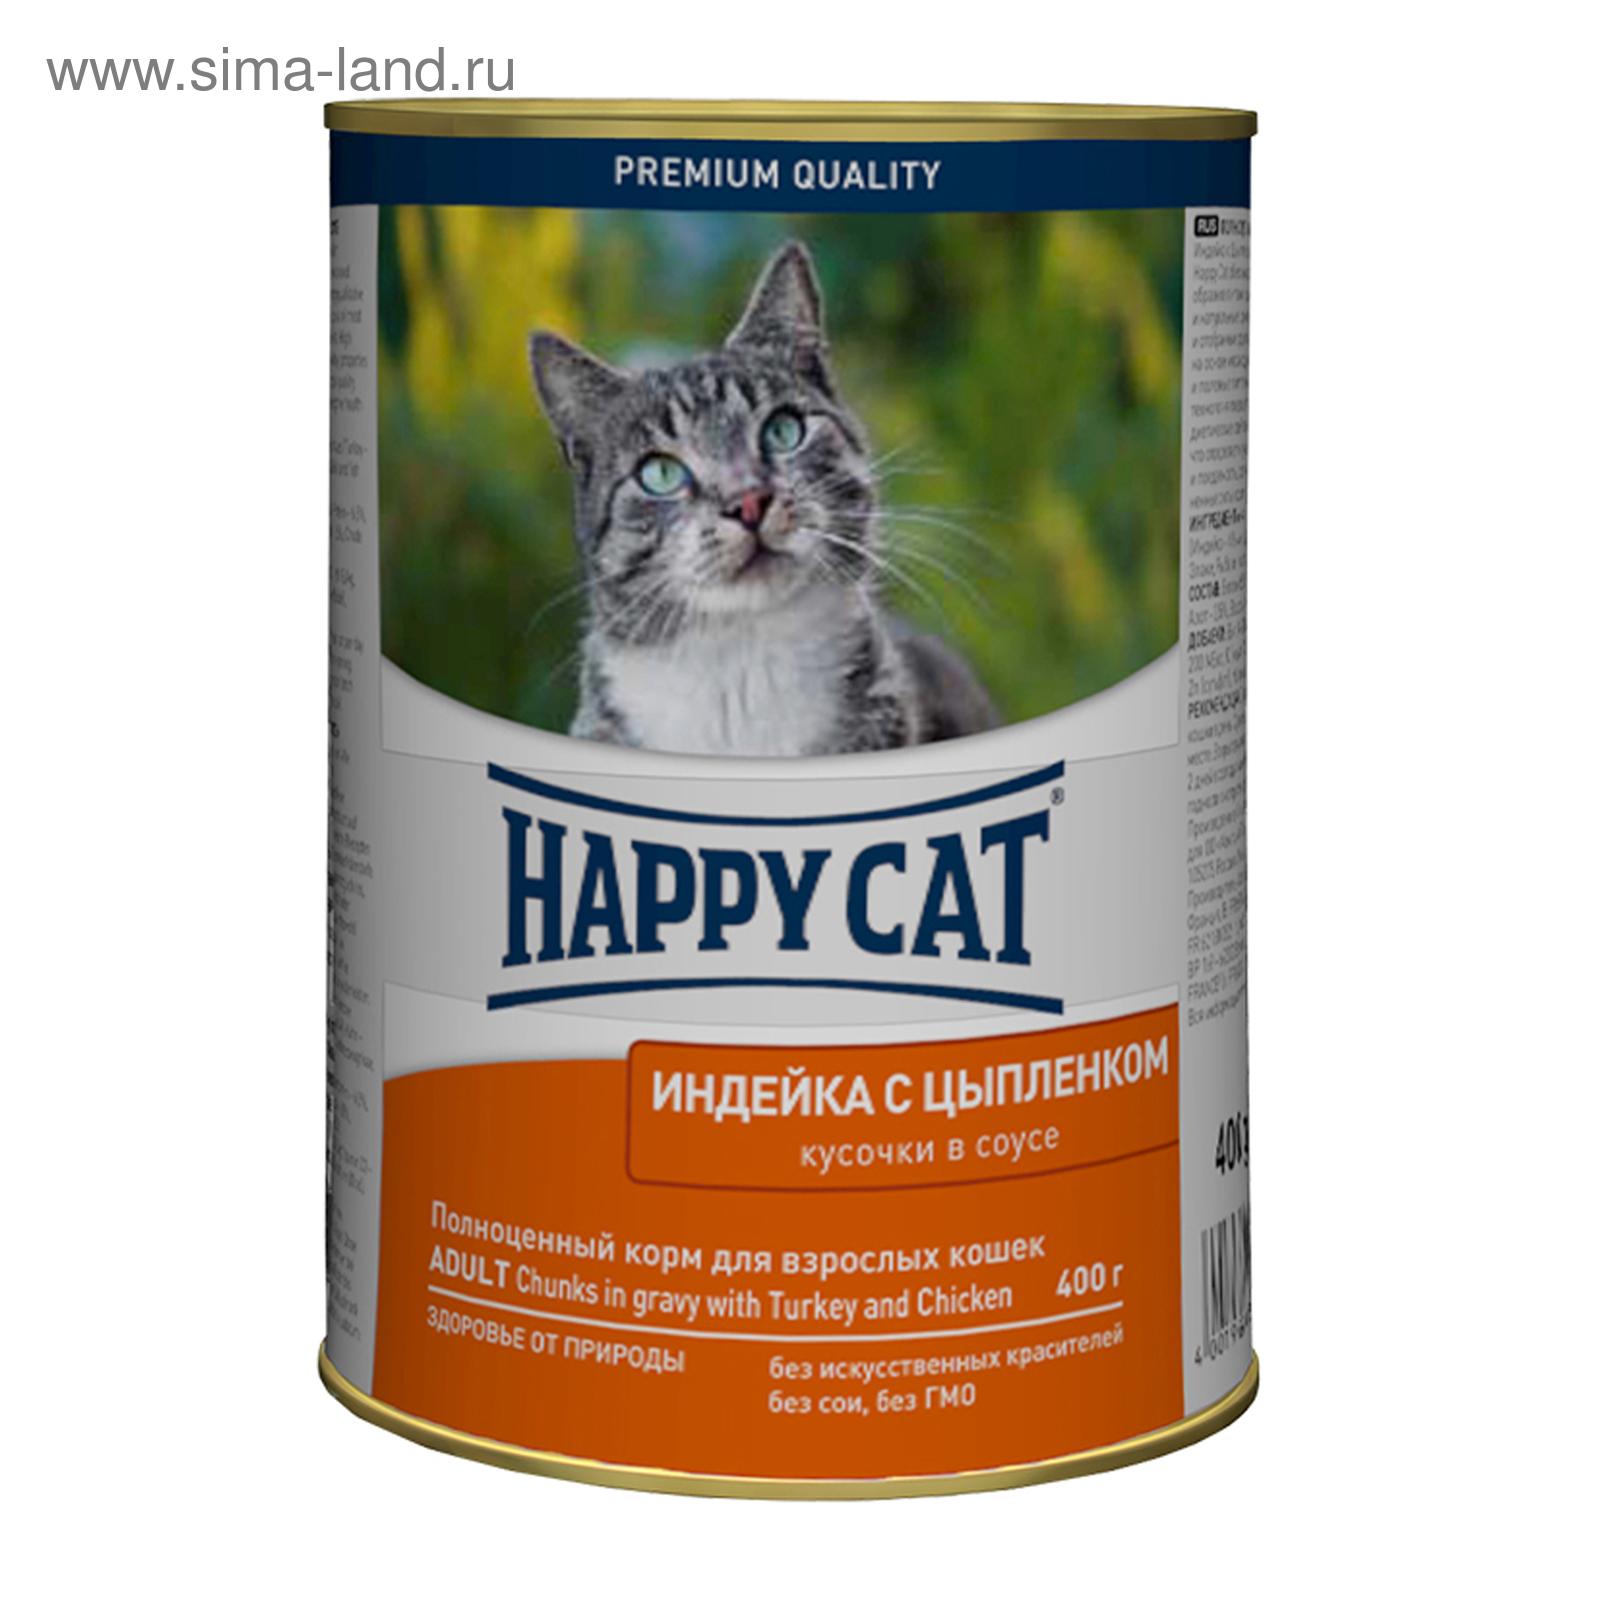 Корм happy cat влажный